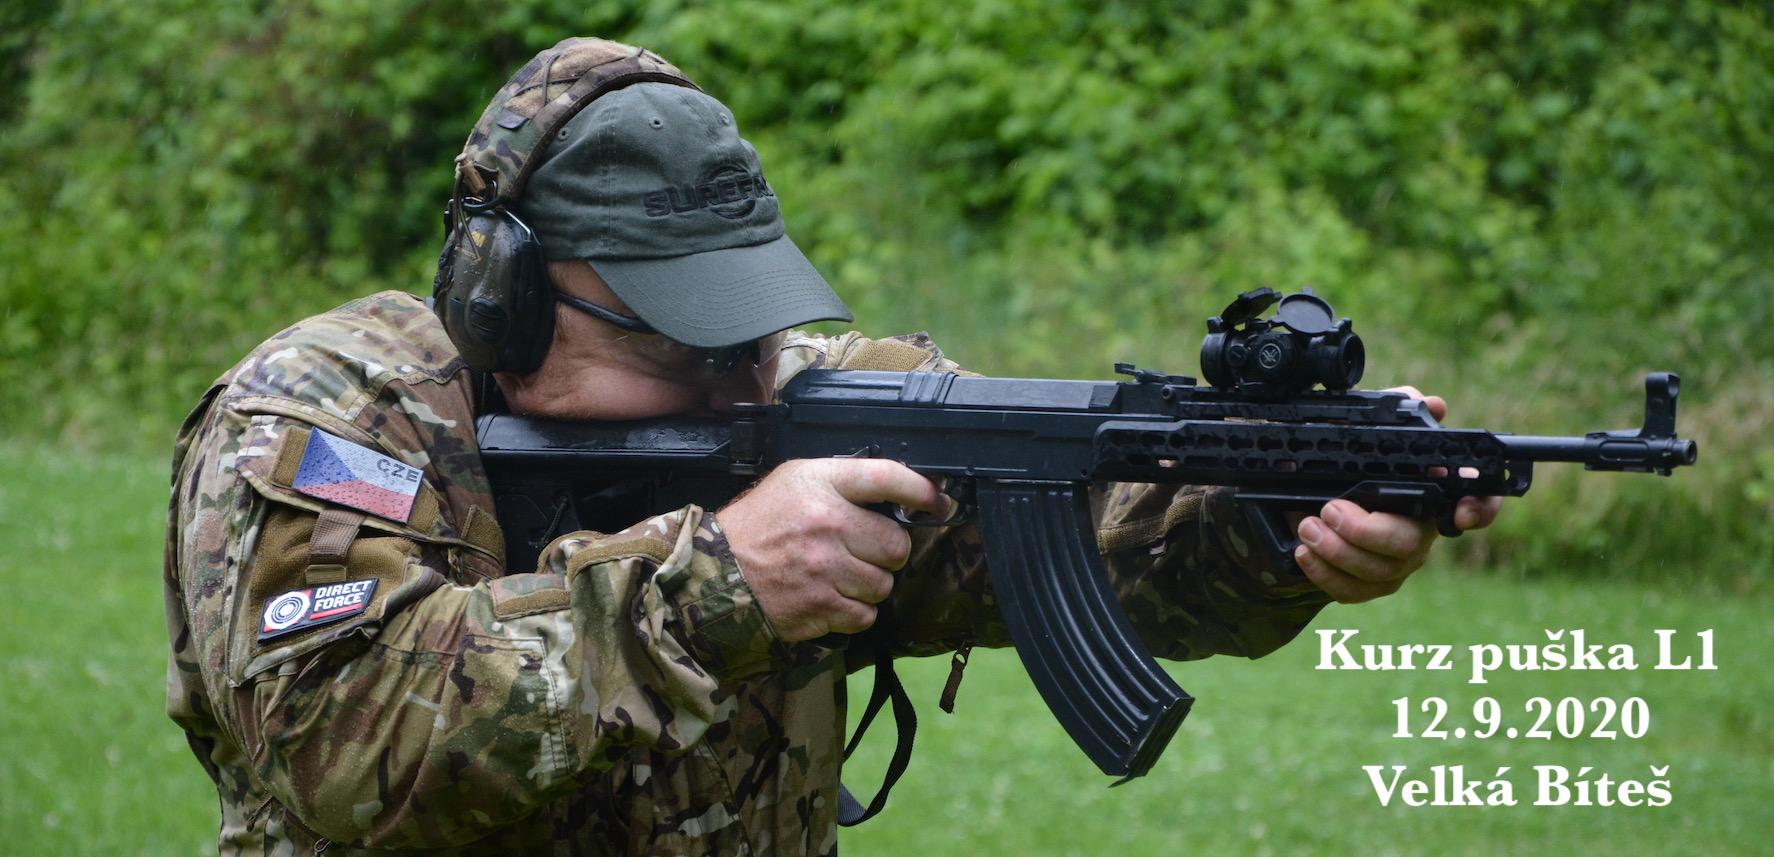 Kurz puška L1 dne 12.9.2020